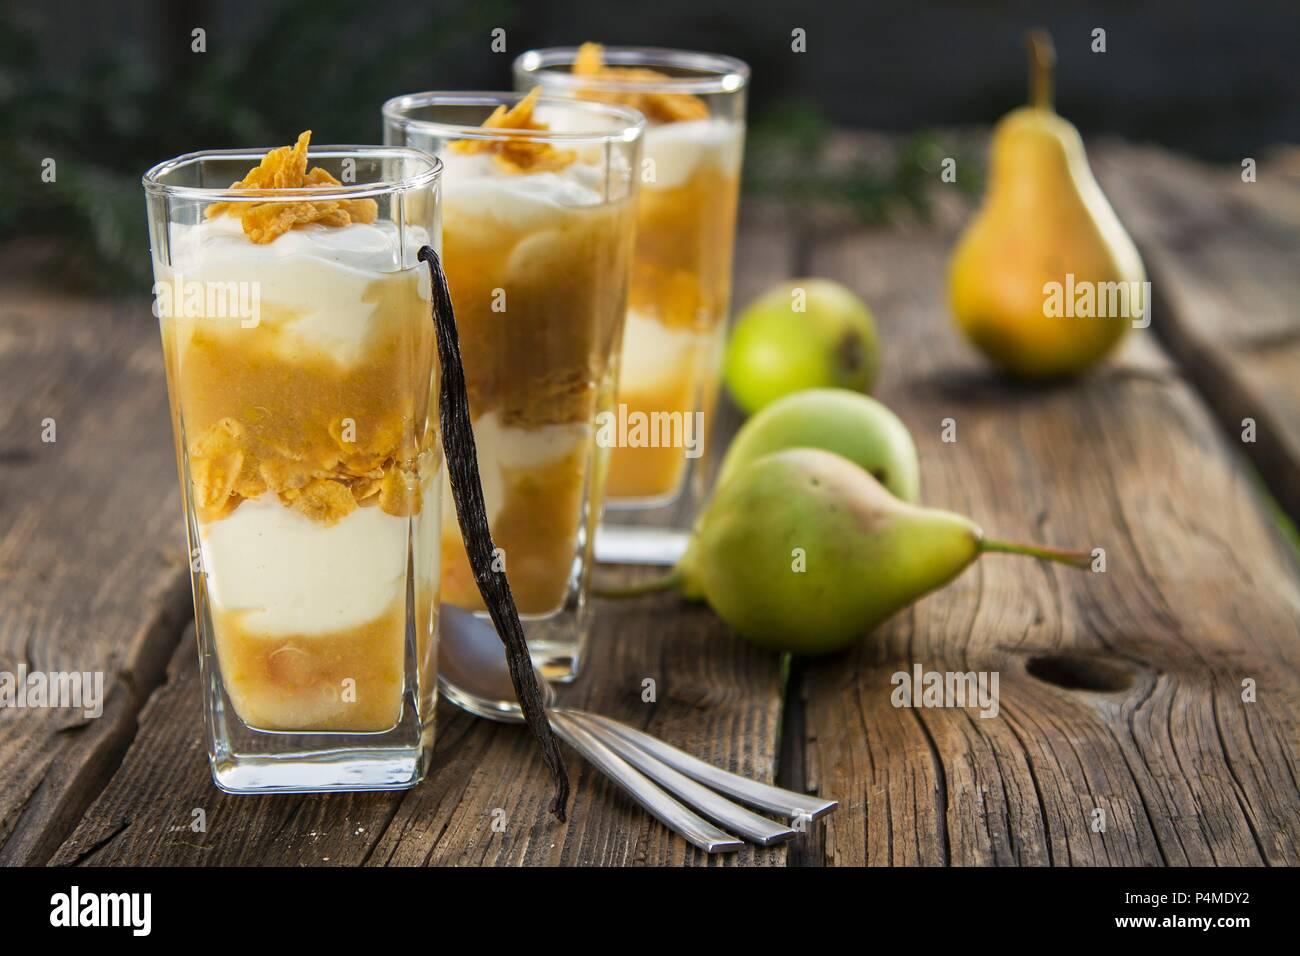 Birne Desserts mit Vanille Joghurt Stockbild